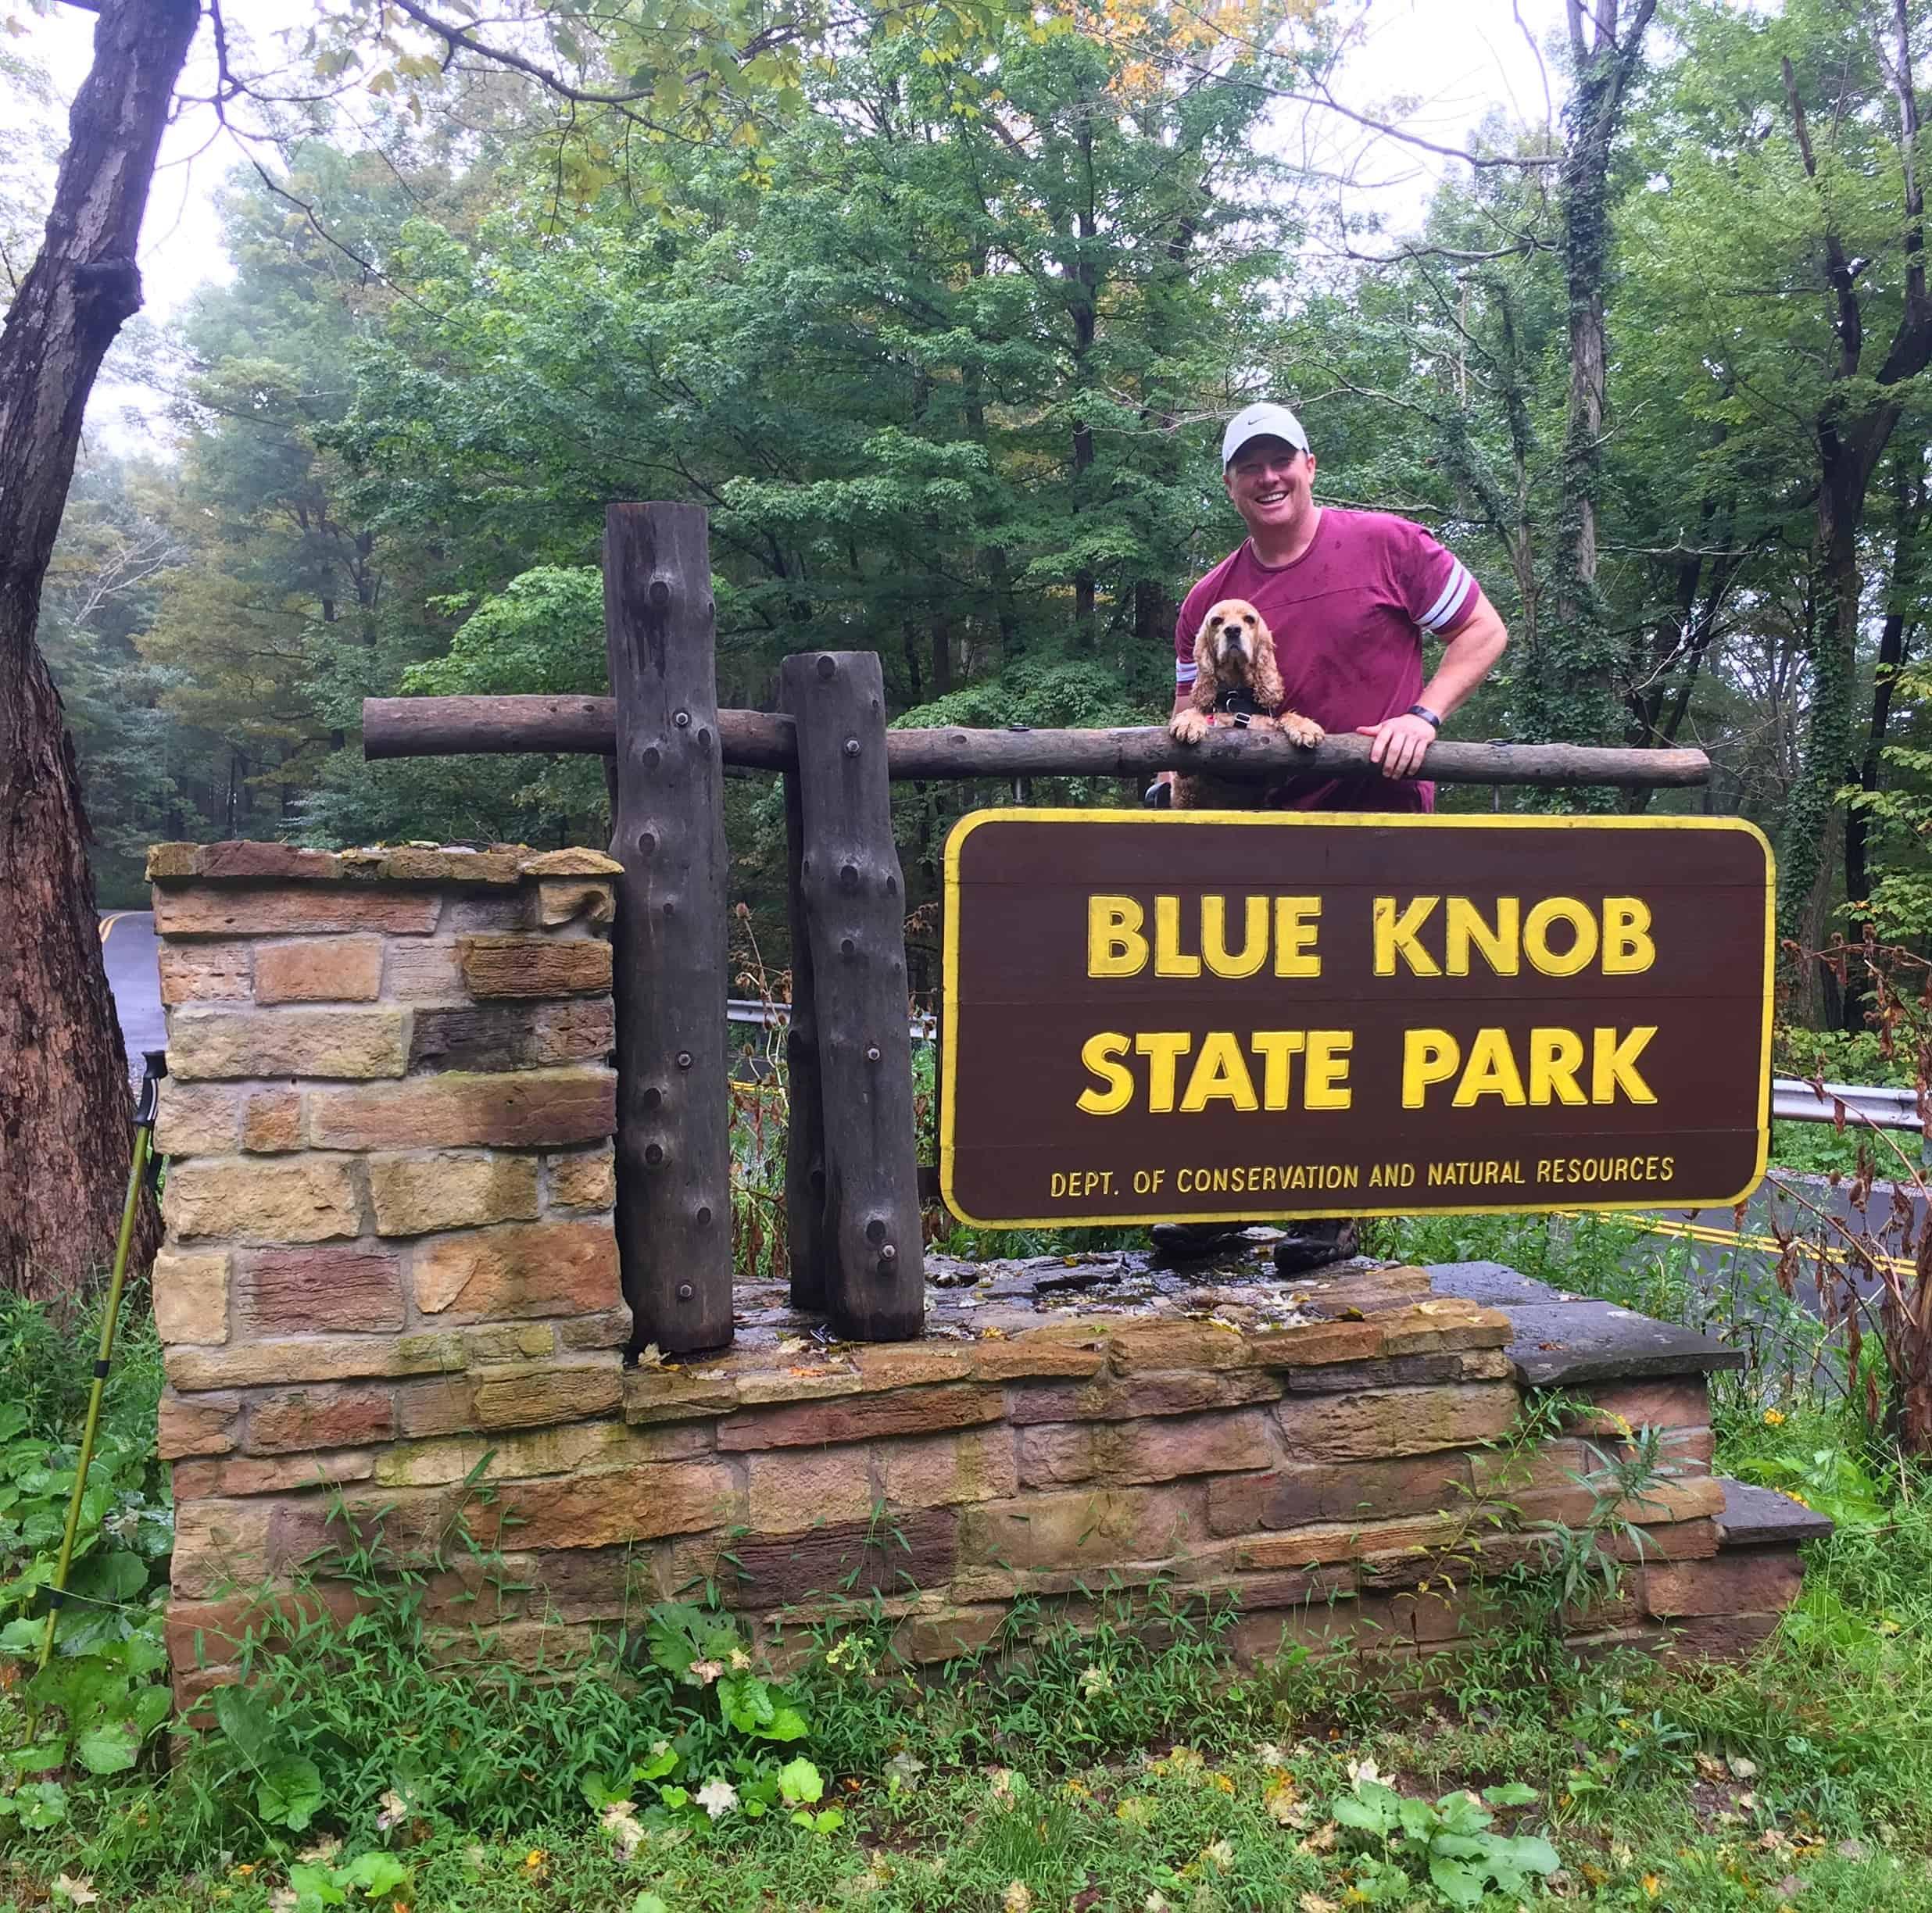 blue knob state park sign